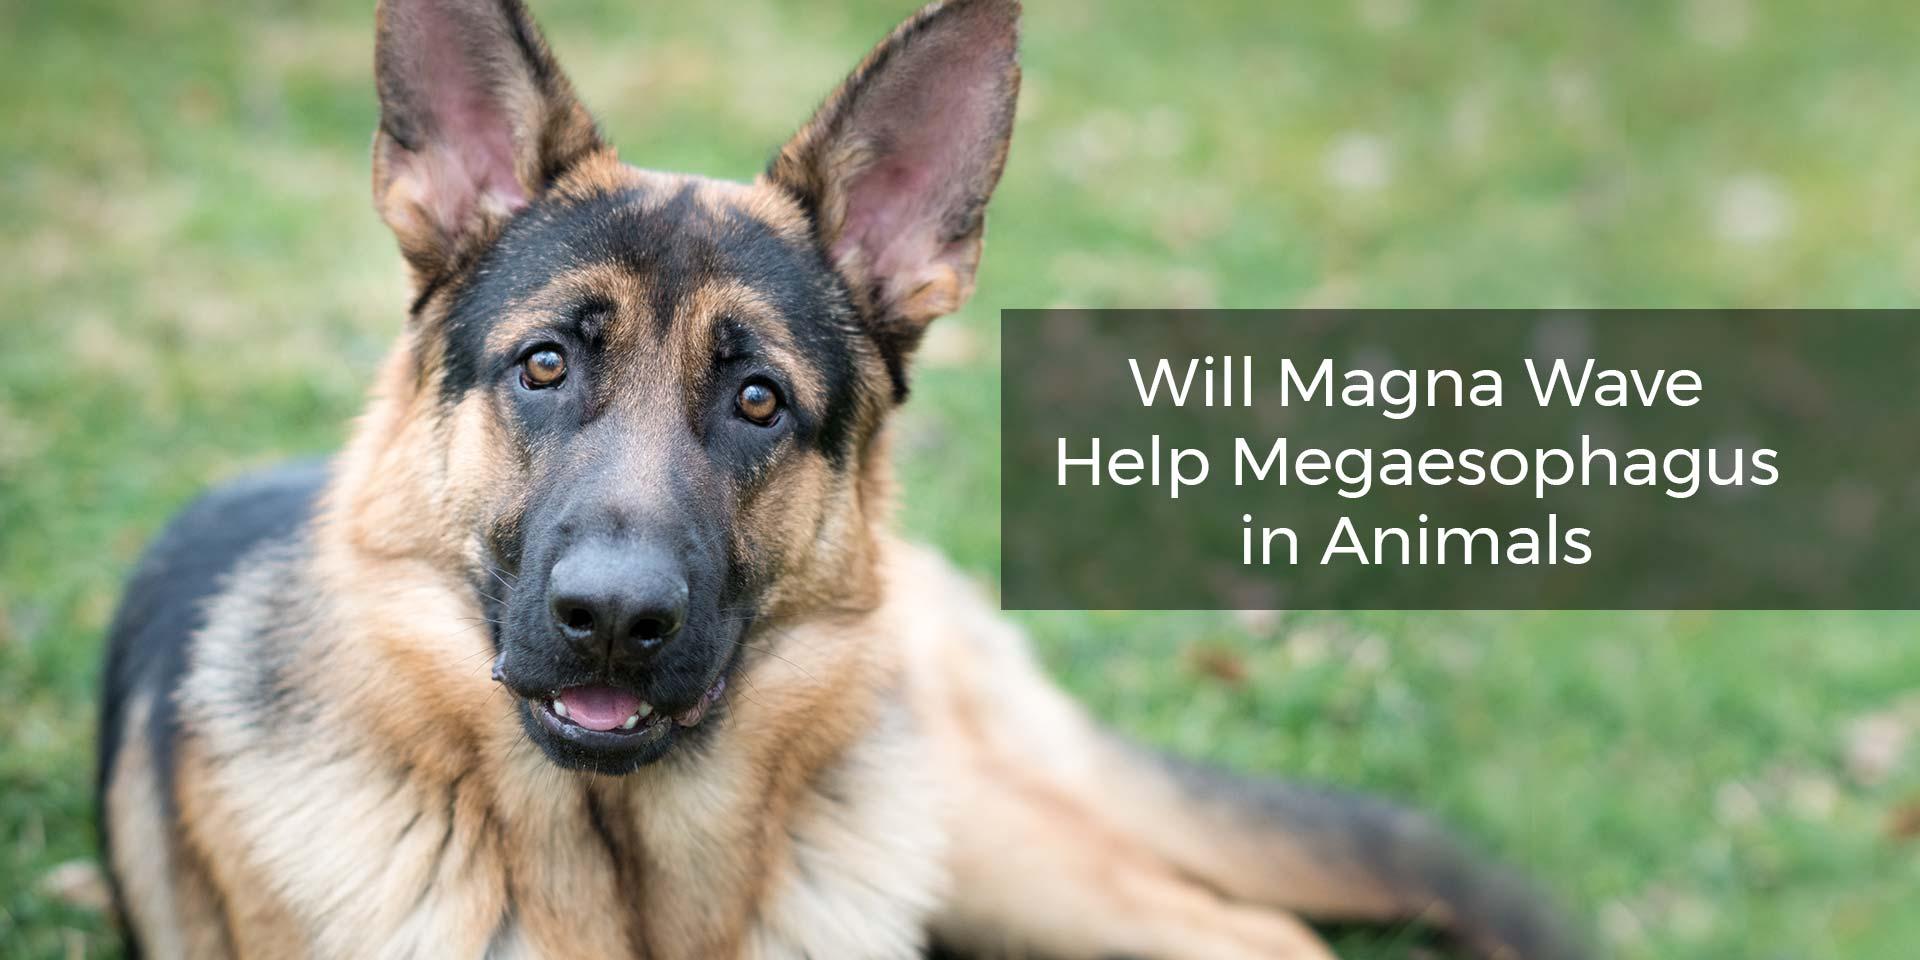 Will Magna Wave Help Megaesophagus in Animals?